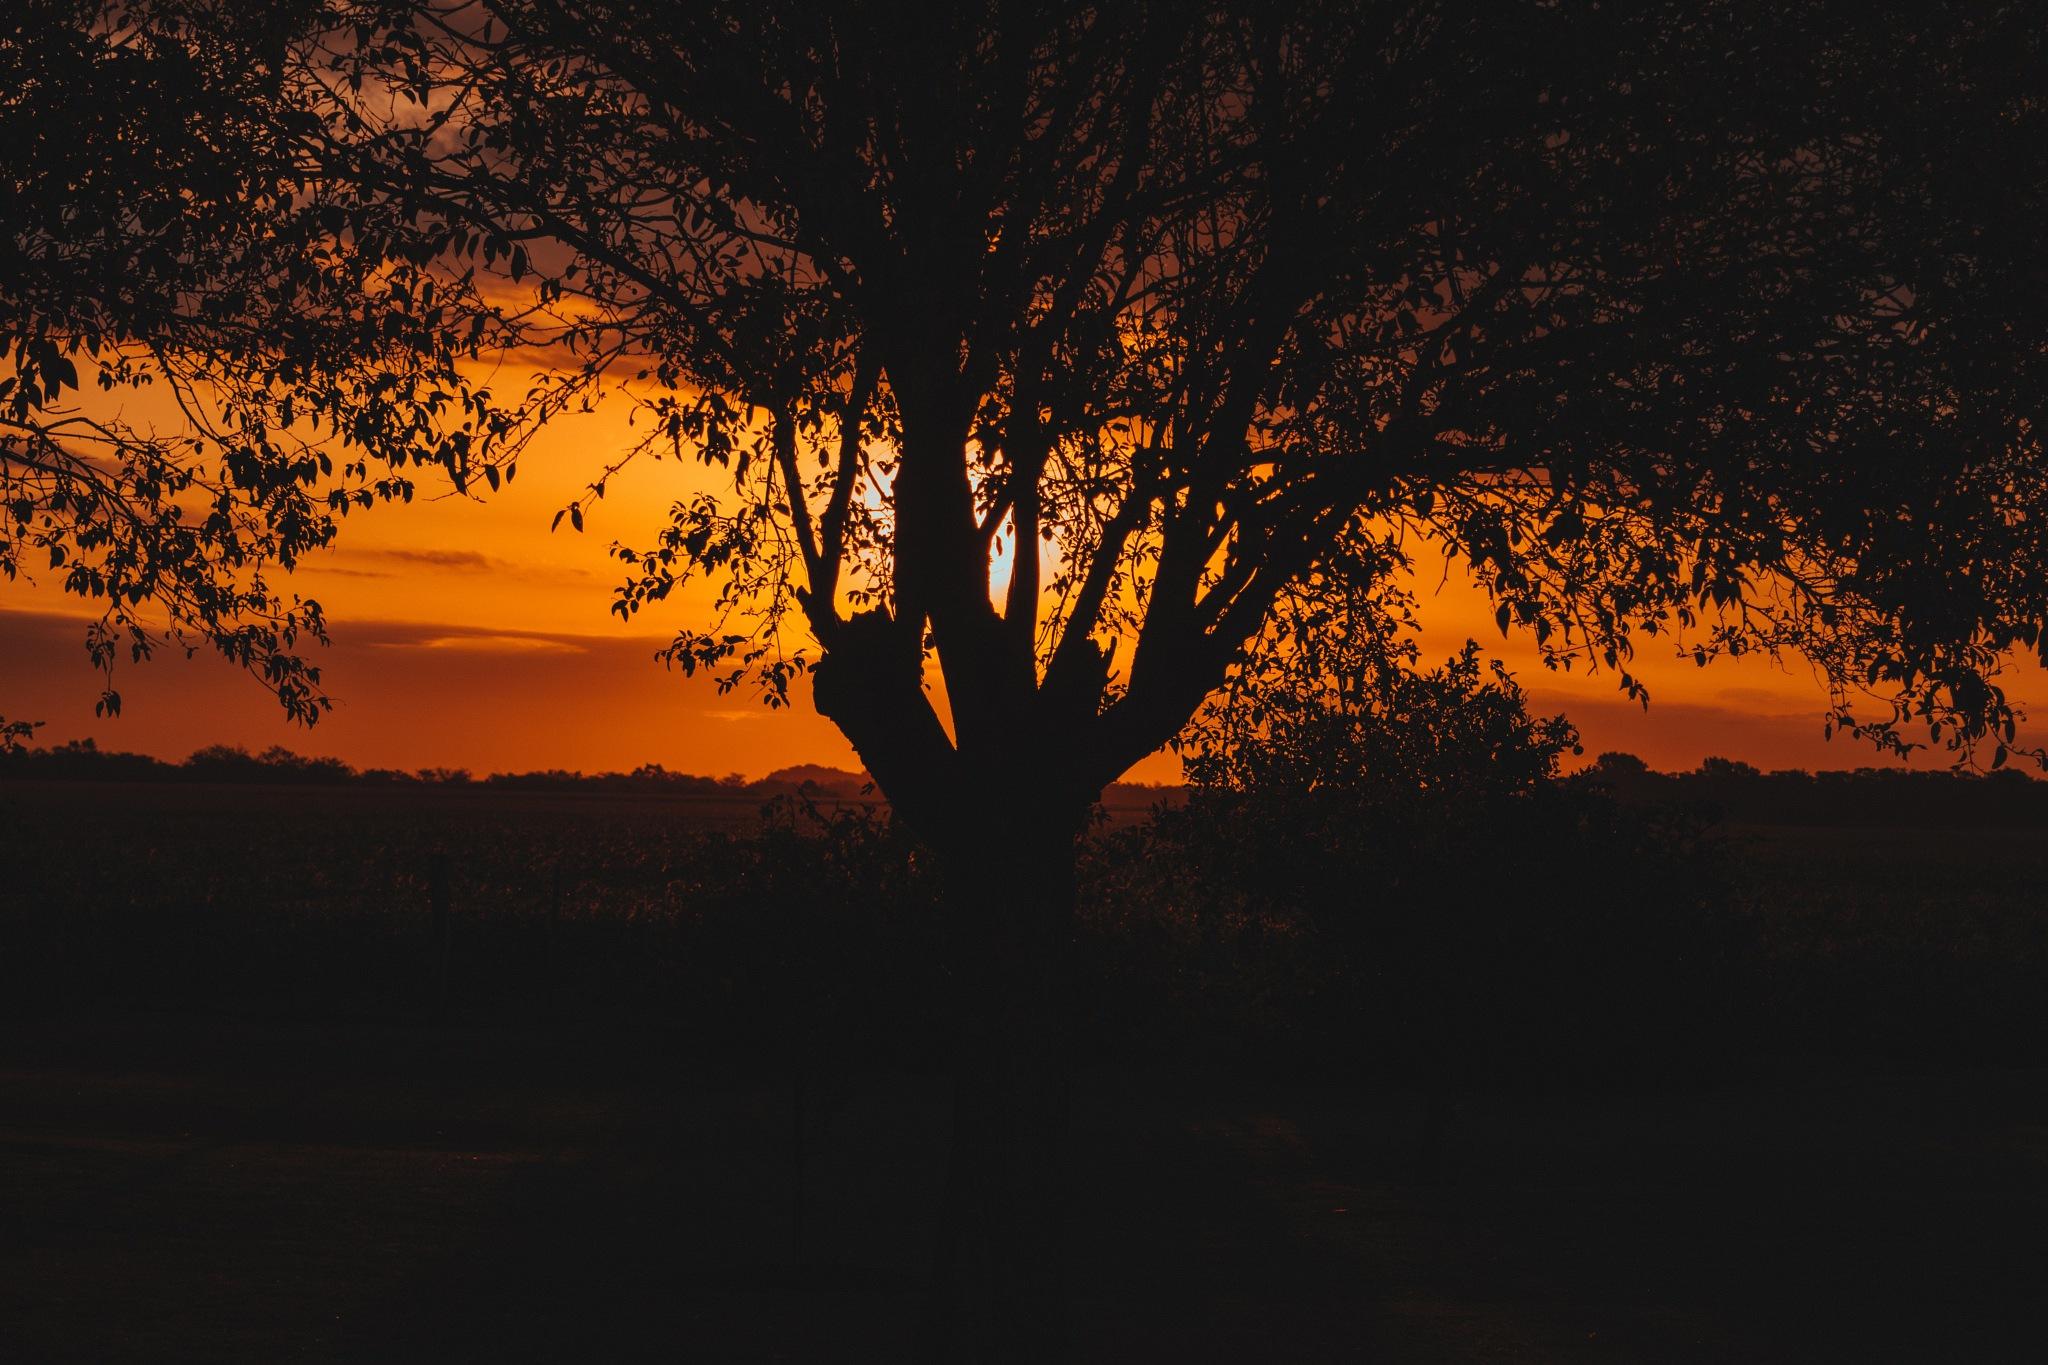 Sunset by Juan Bernardo Garmendia